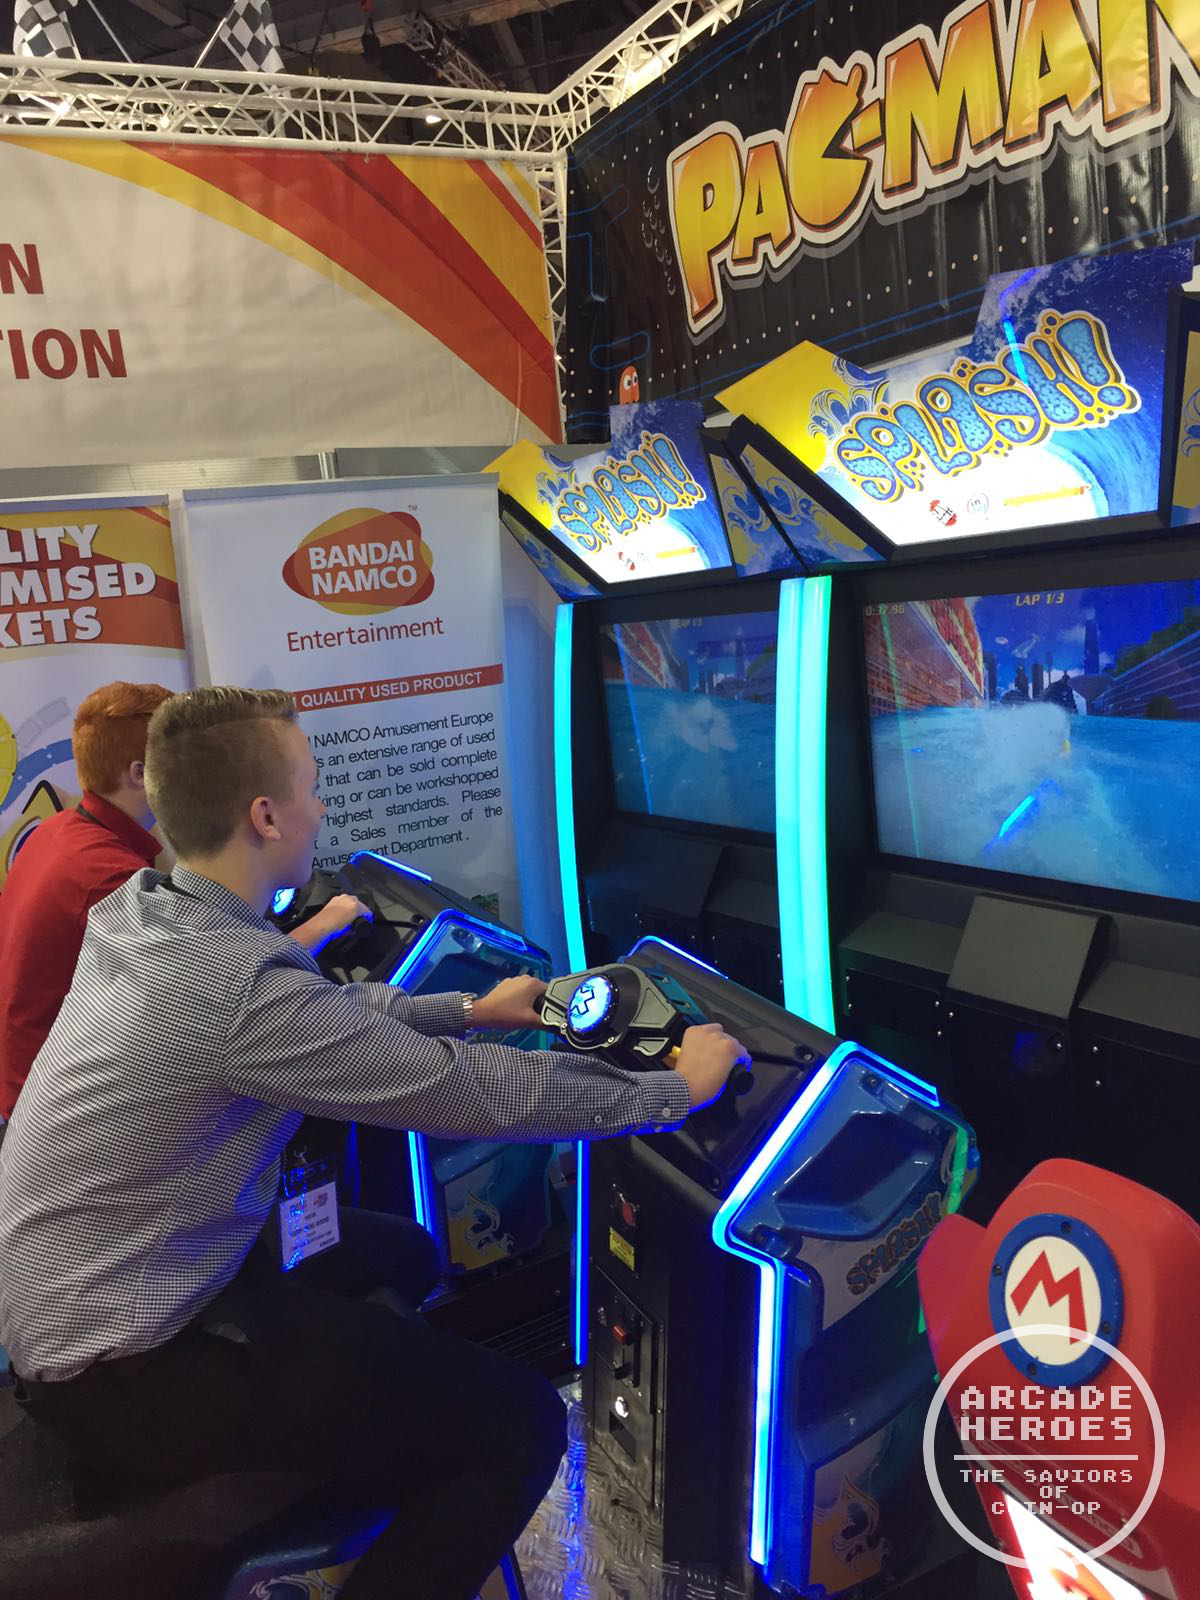 Arcades In Manchester Nh